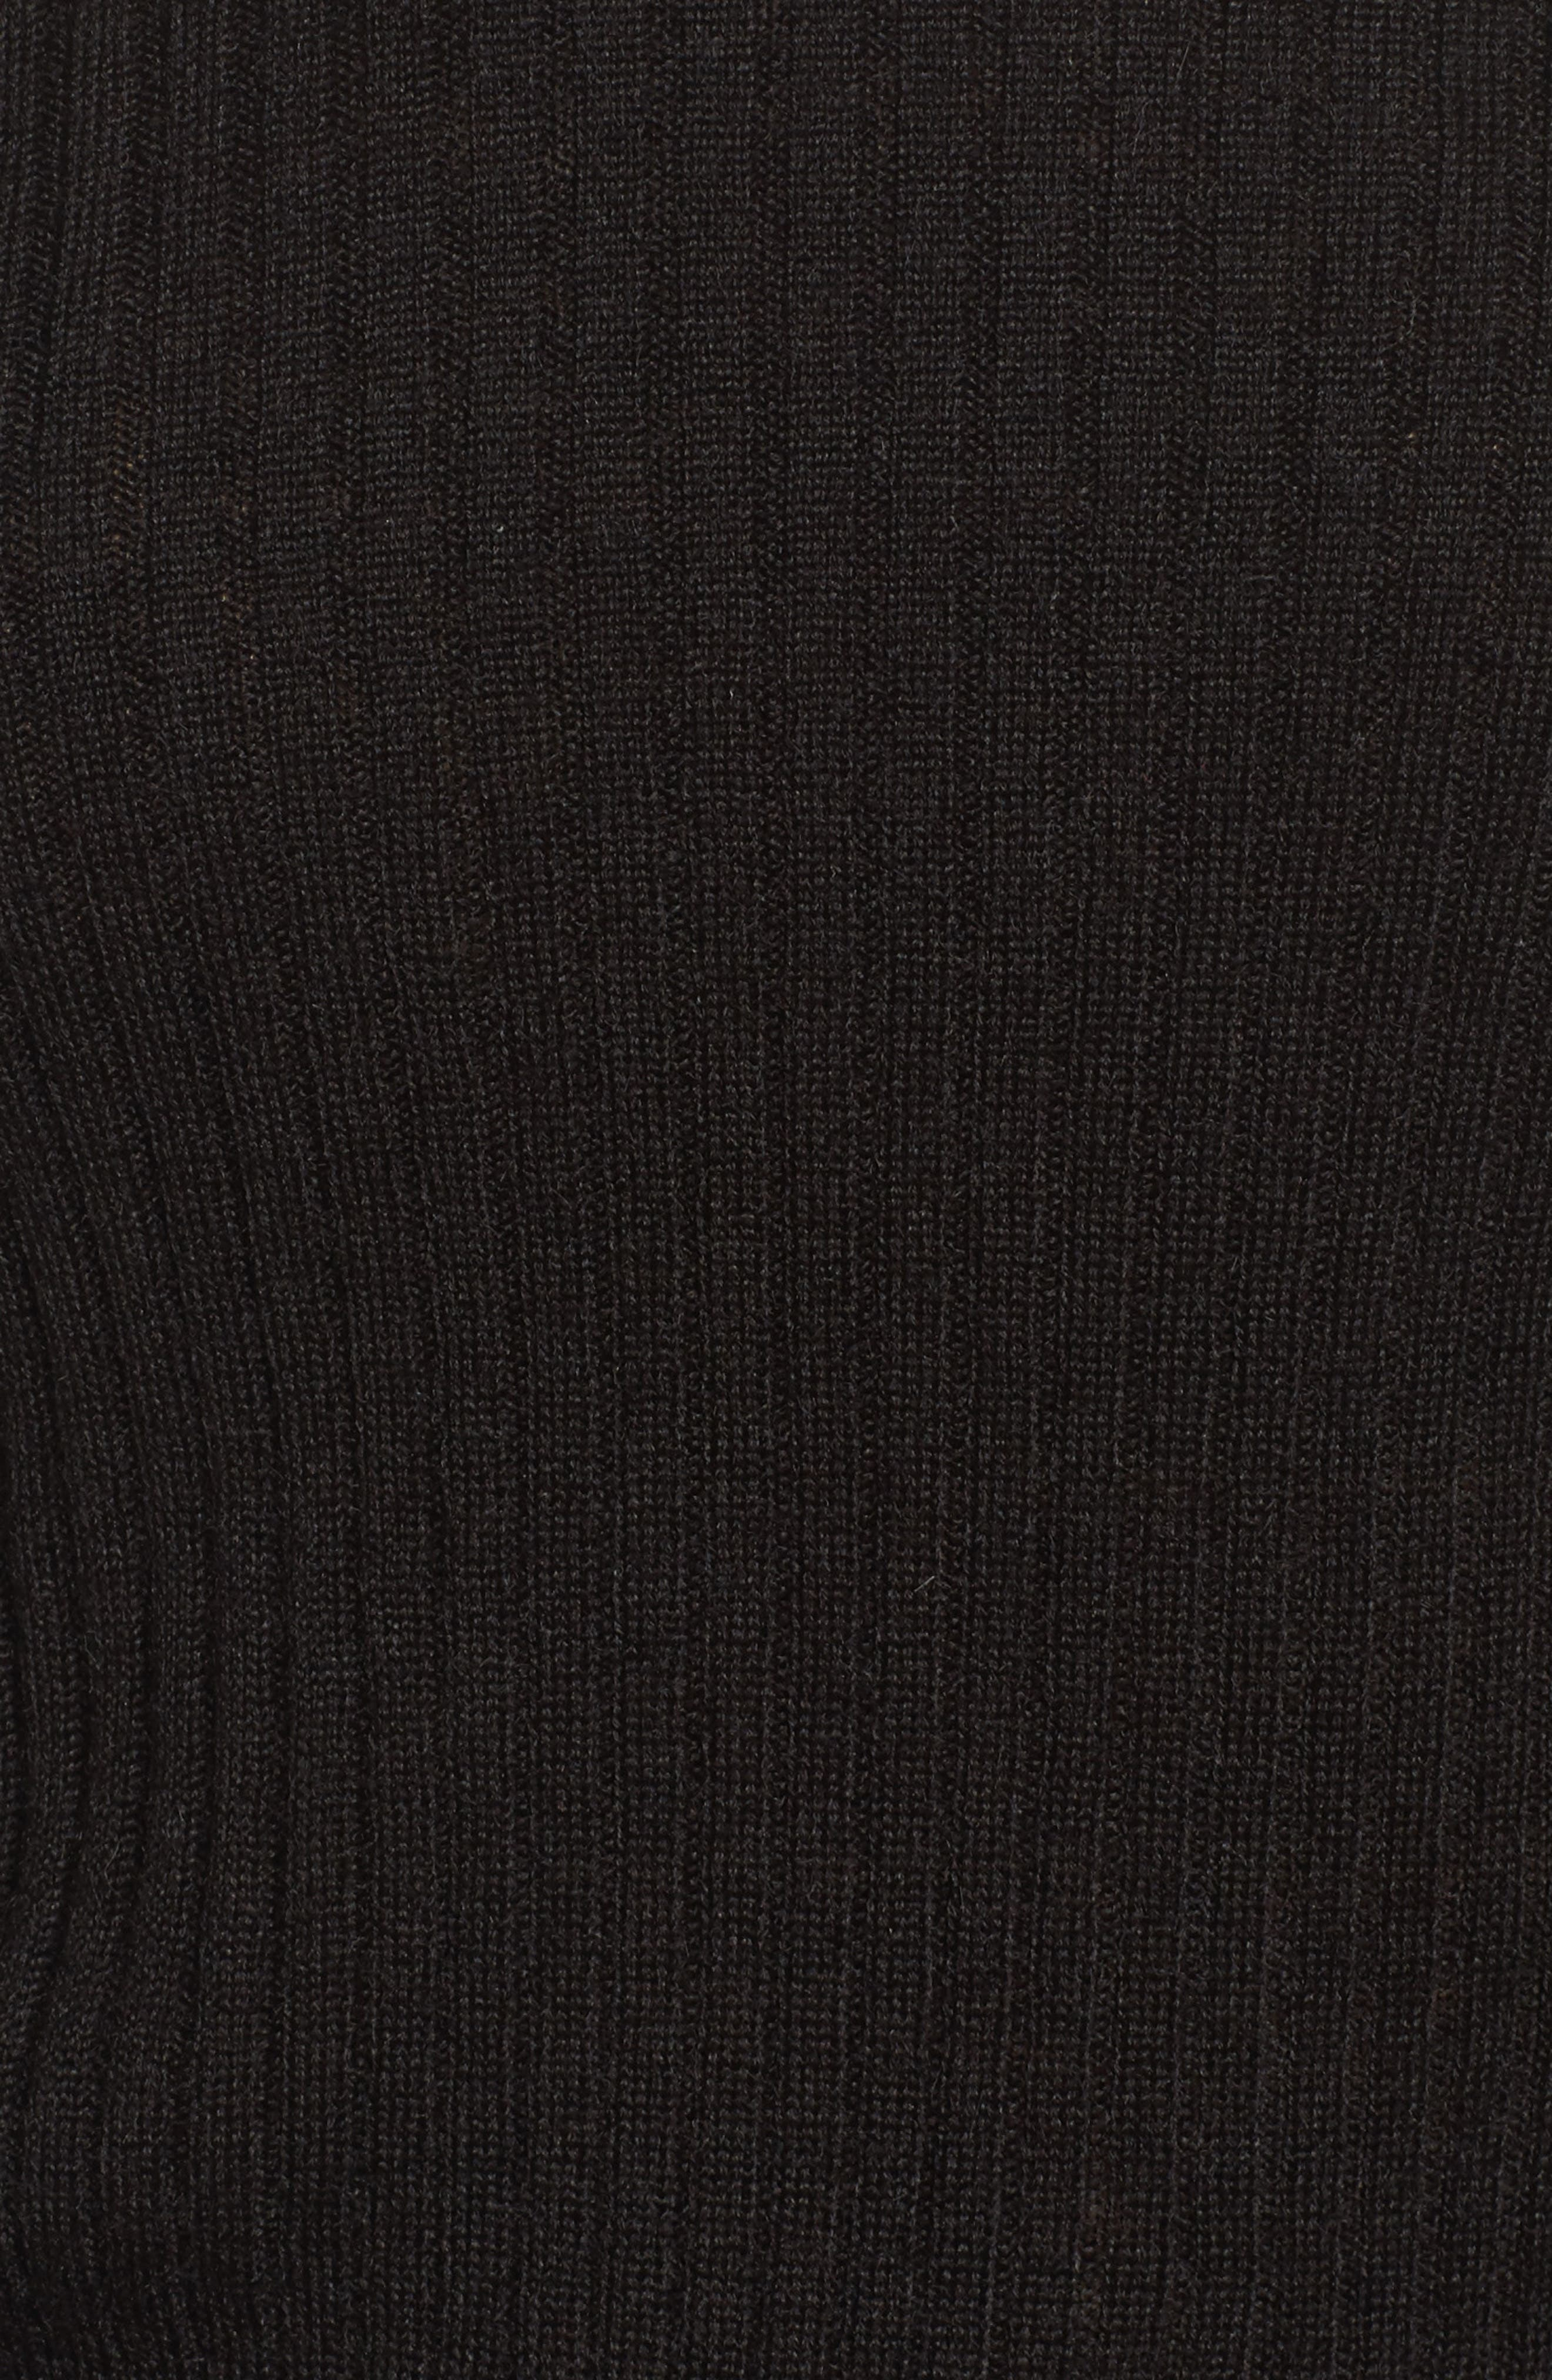 Tiara Bell Sleeve Sweater,                             Alternate thumbnail 5, color,                             001